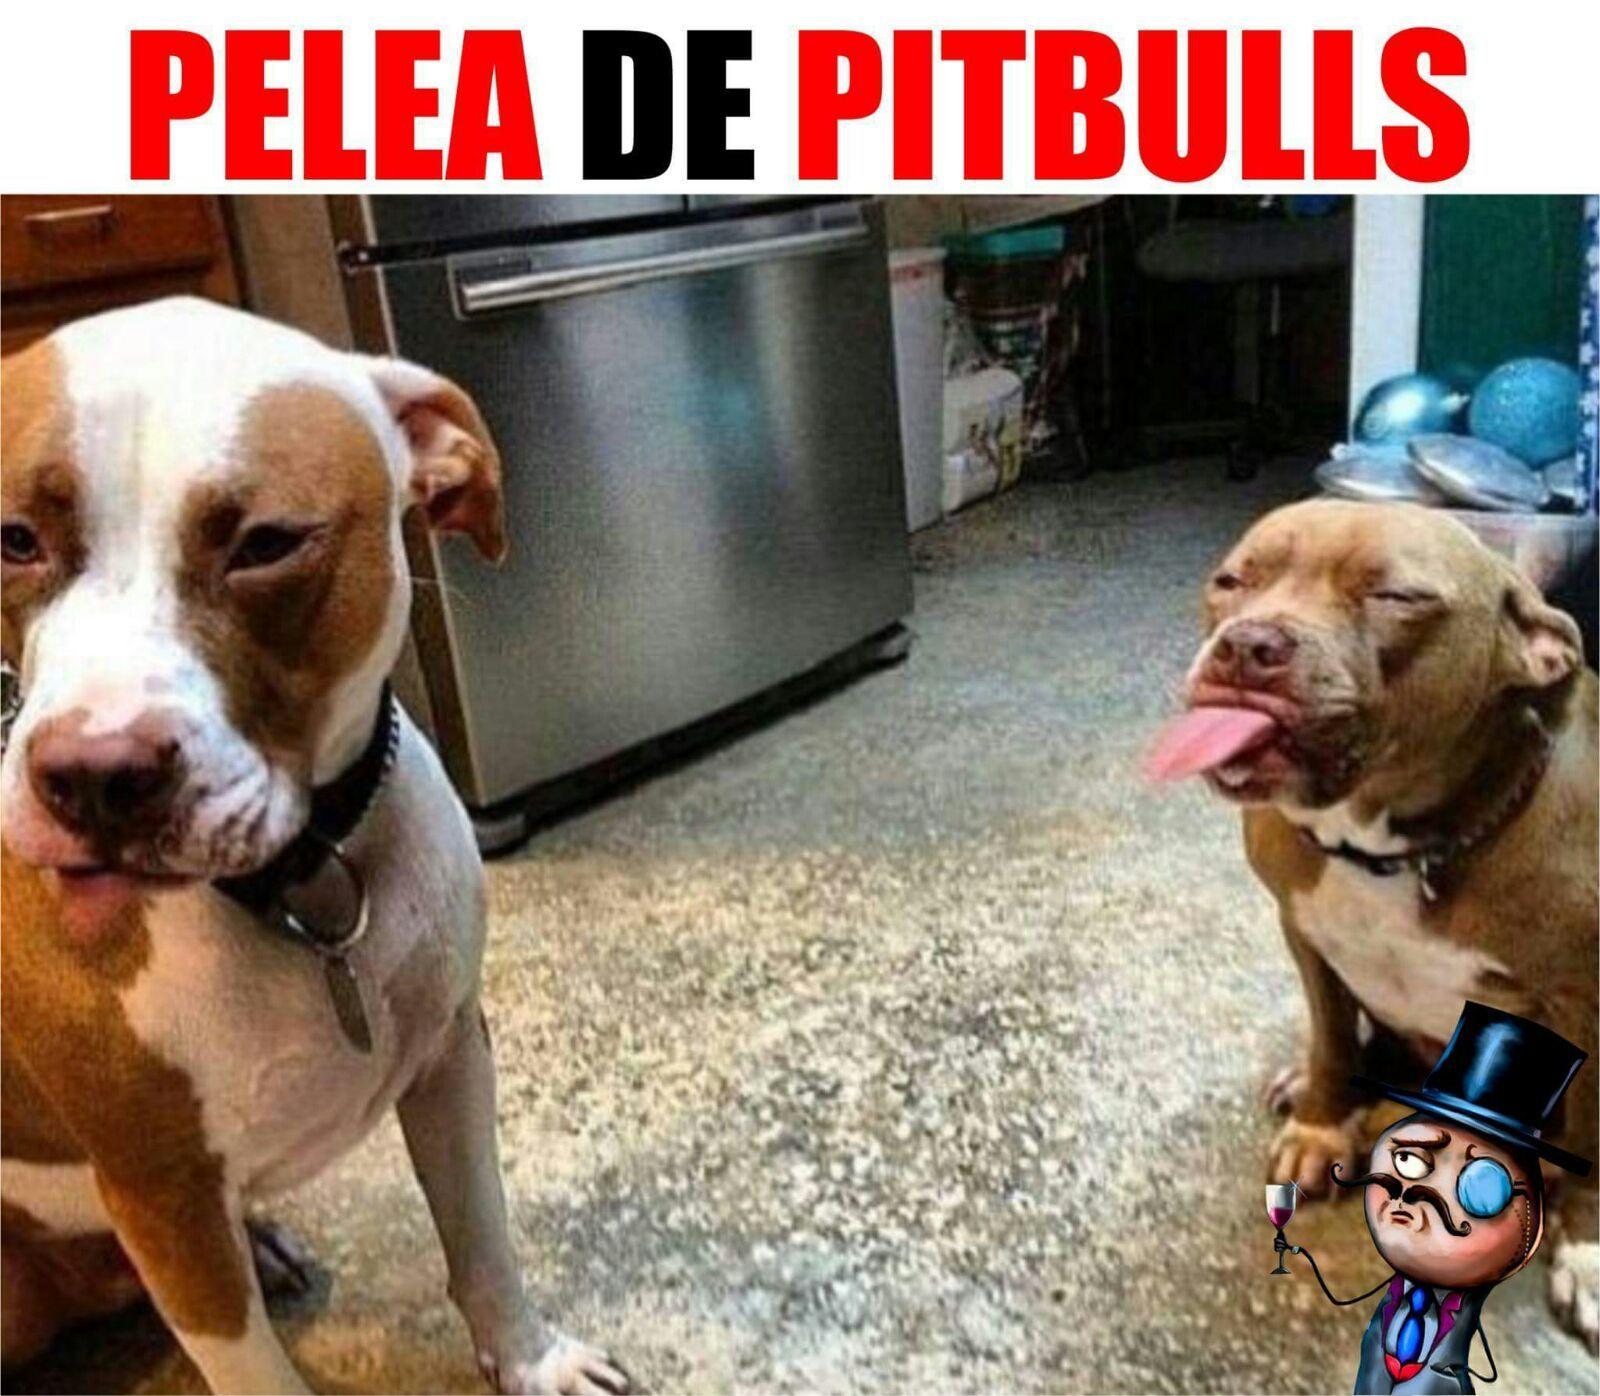 Meme Perro Pelea Pitbull Animal Captions Funny Animals Funny Dogs